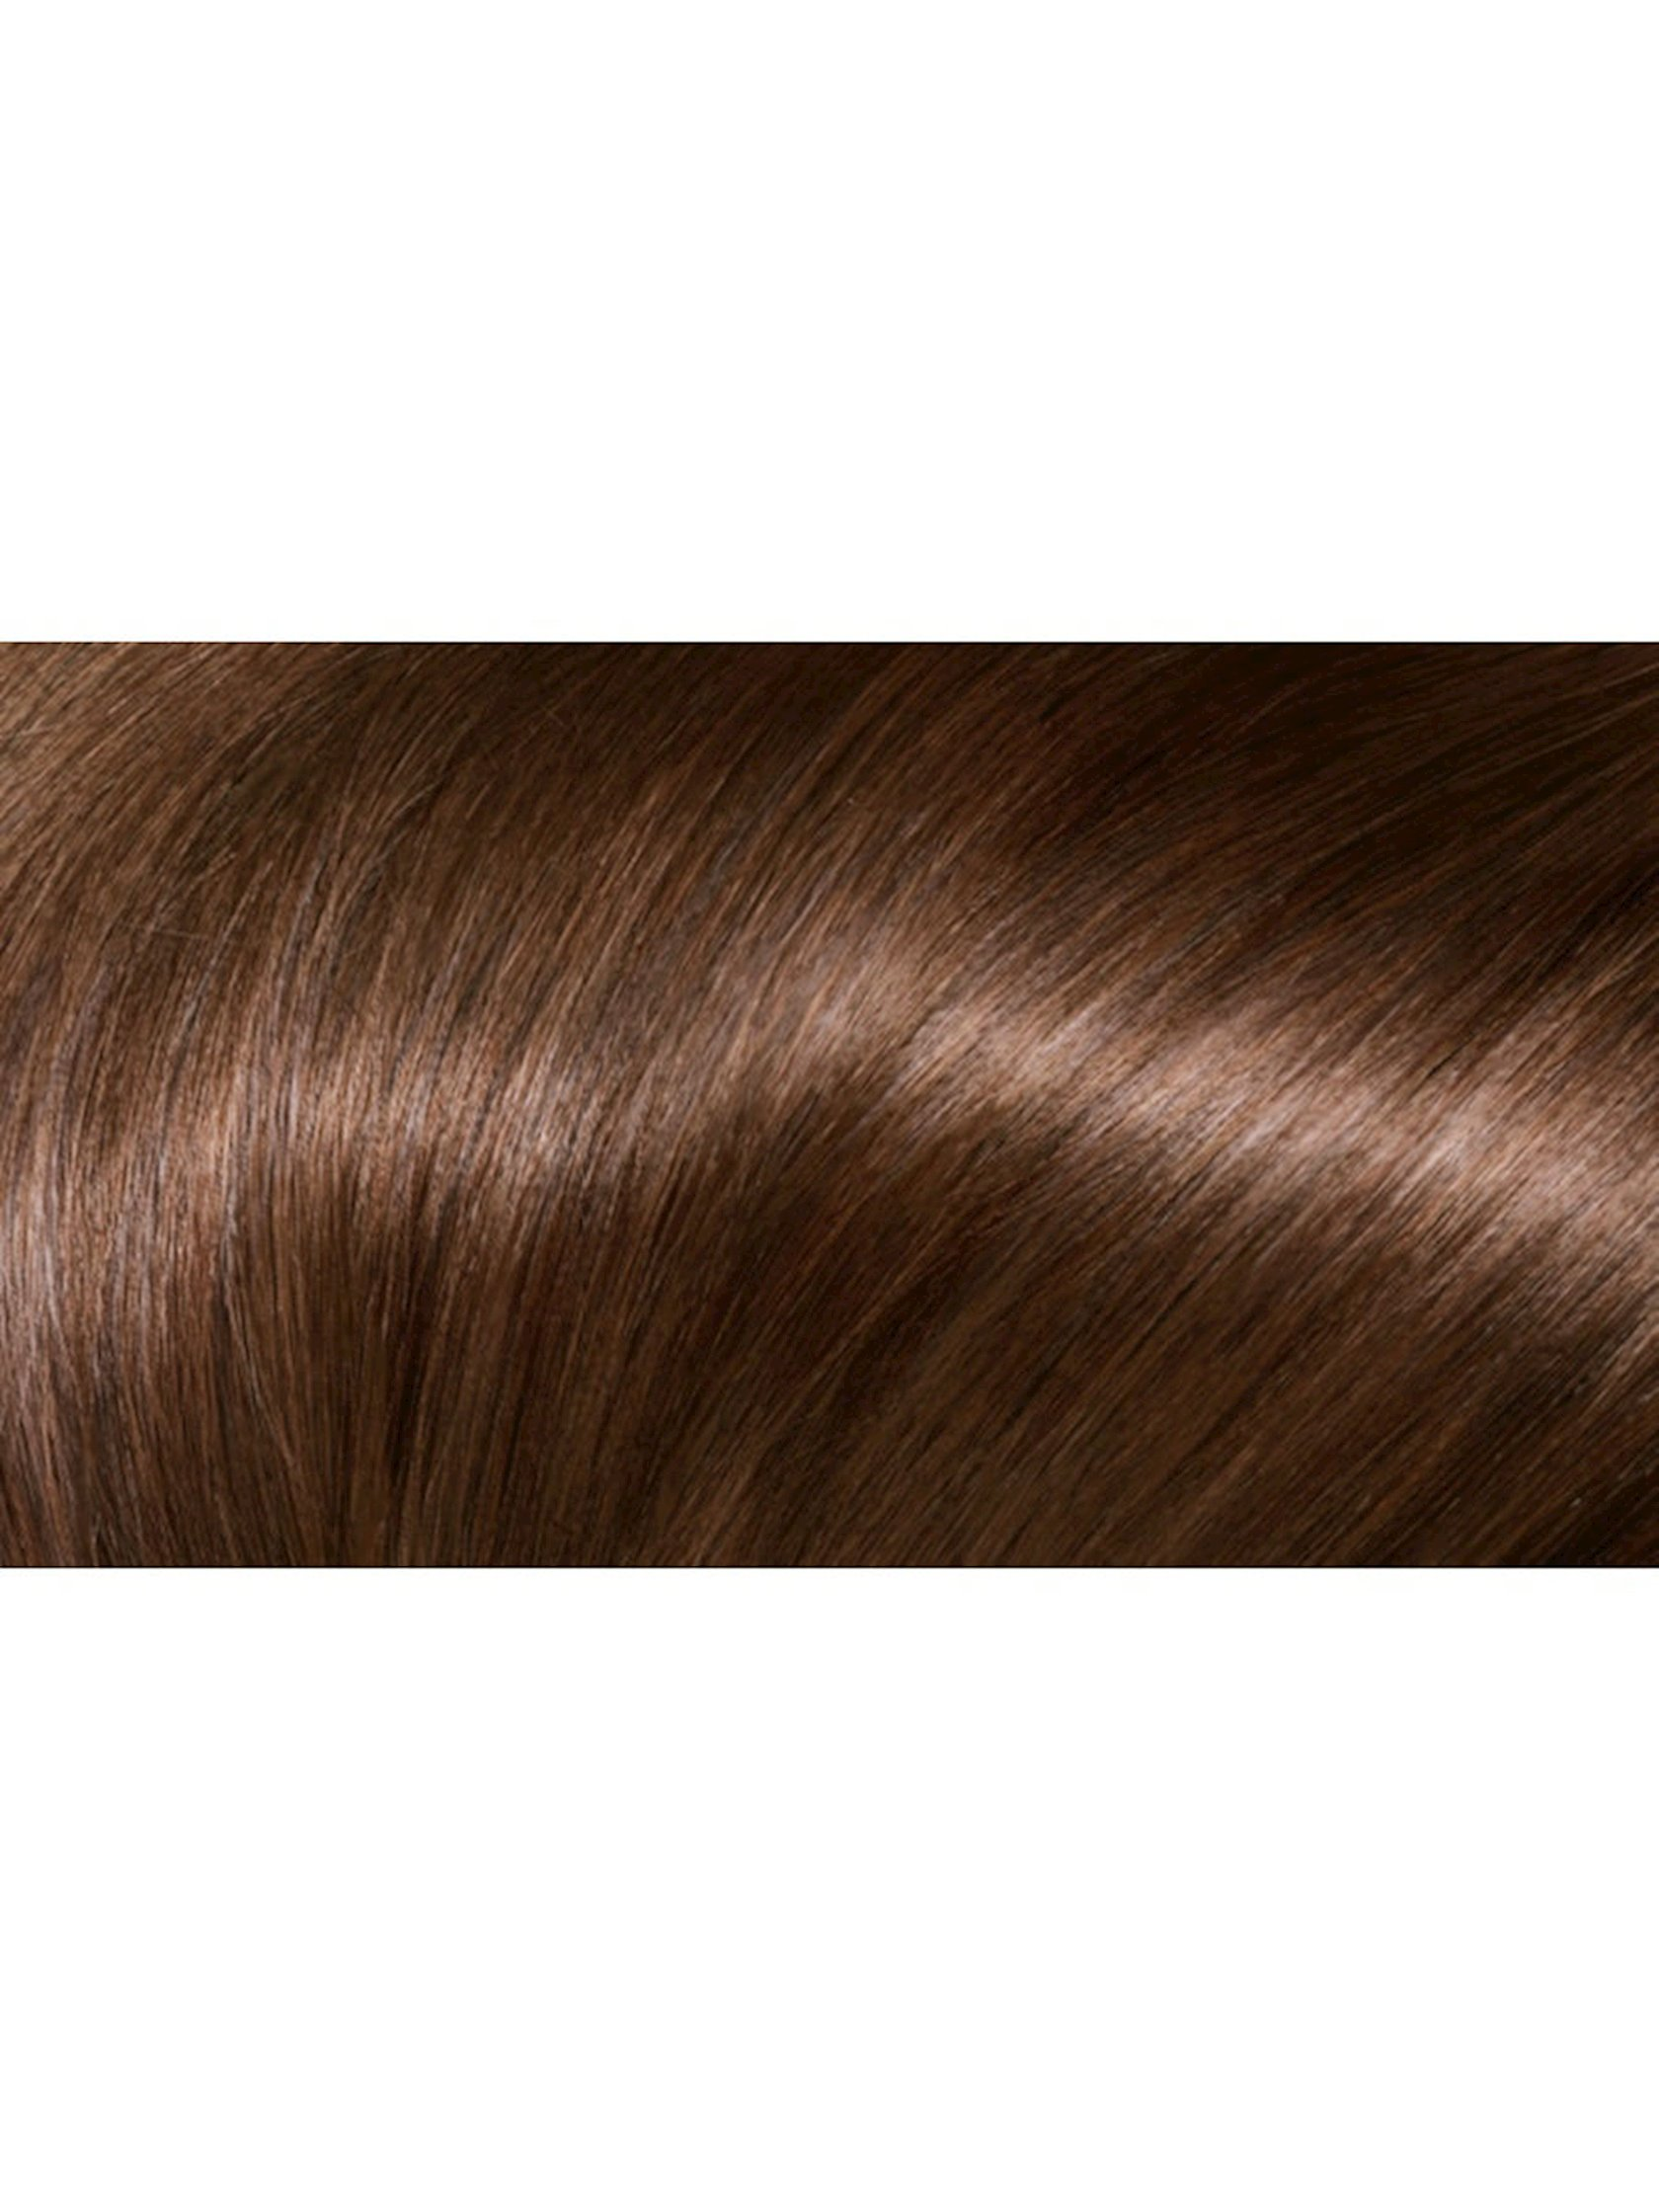 Saç üçün qalıcı krem-boya L'Oreal Paris Casting Creme Gloss ammonyaksız 600 Tünd sarışın